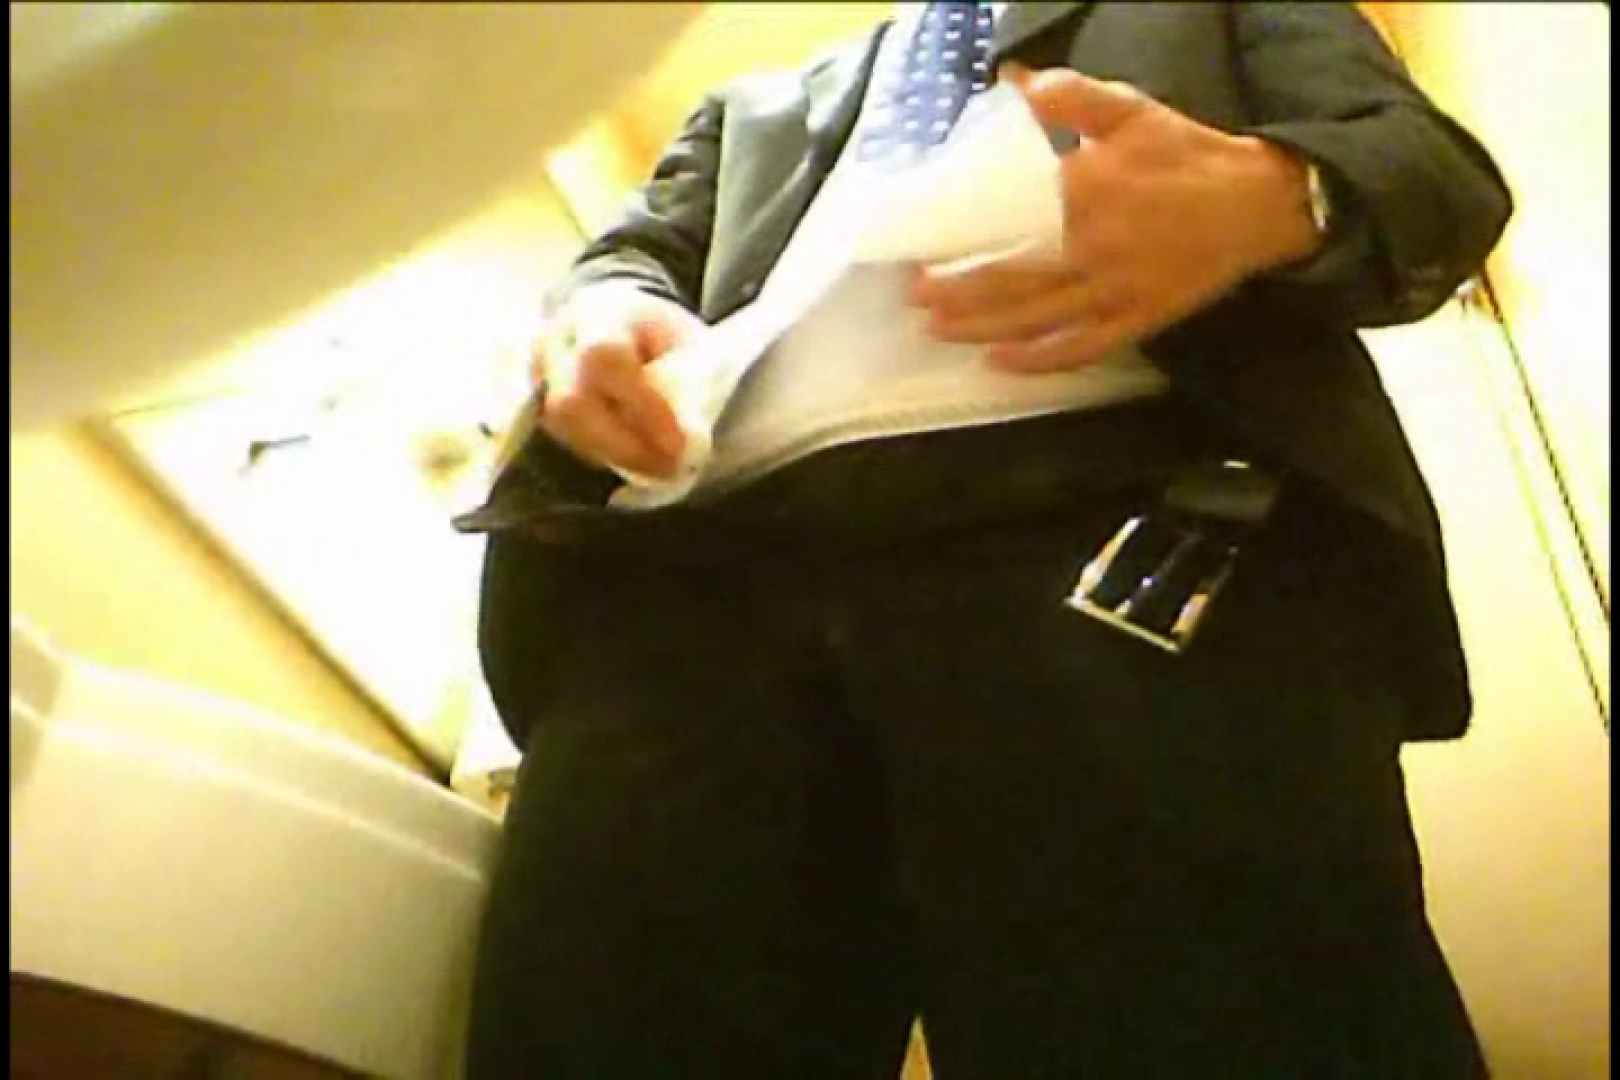 Gボーイ初投稿!掴み取りさんの洗面所覗き!in新幹線!VOL.01 スーツボーイズ | 男天国  103pic 68